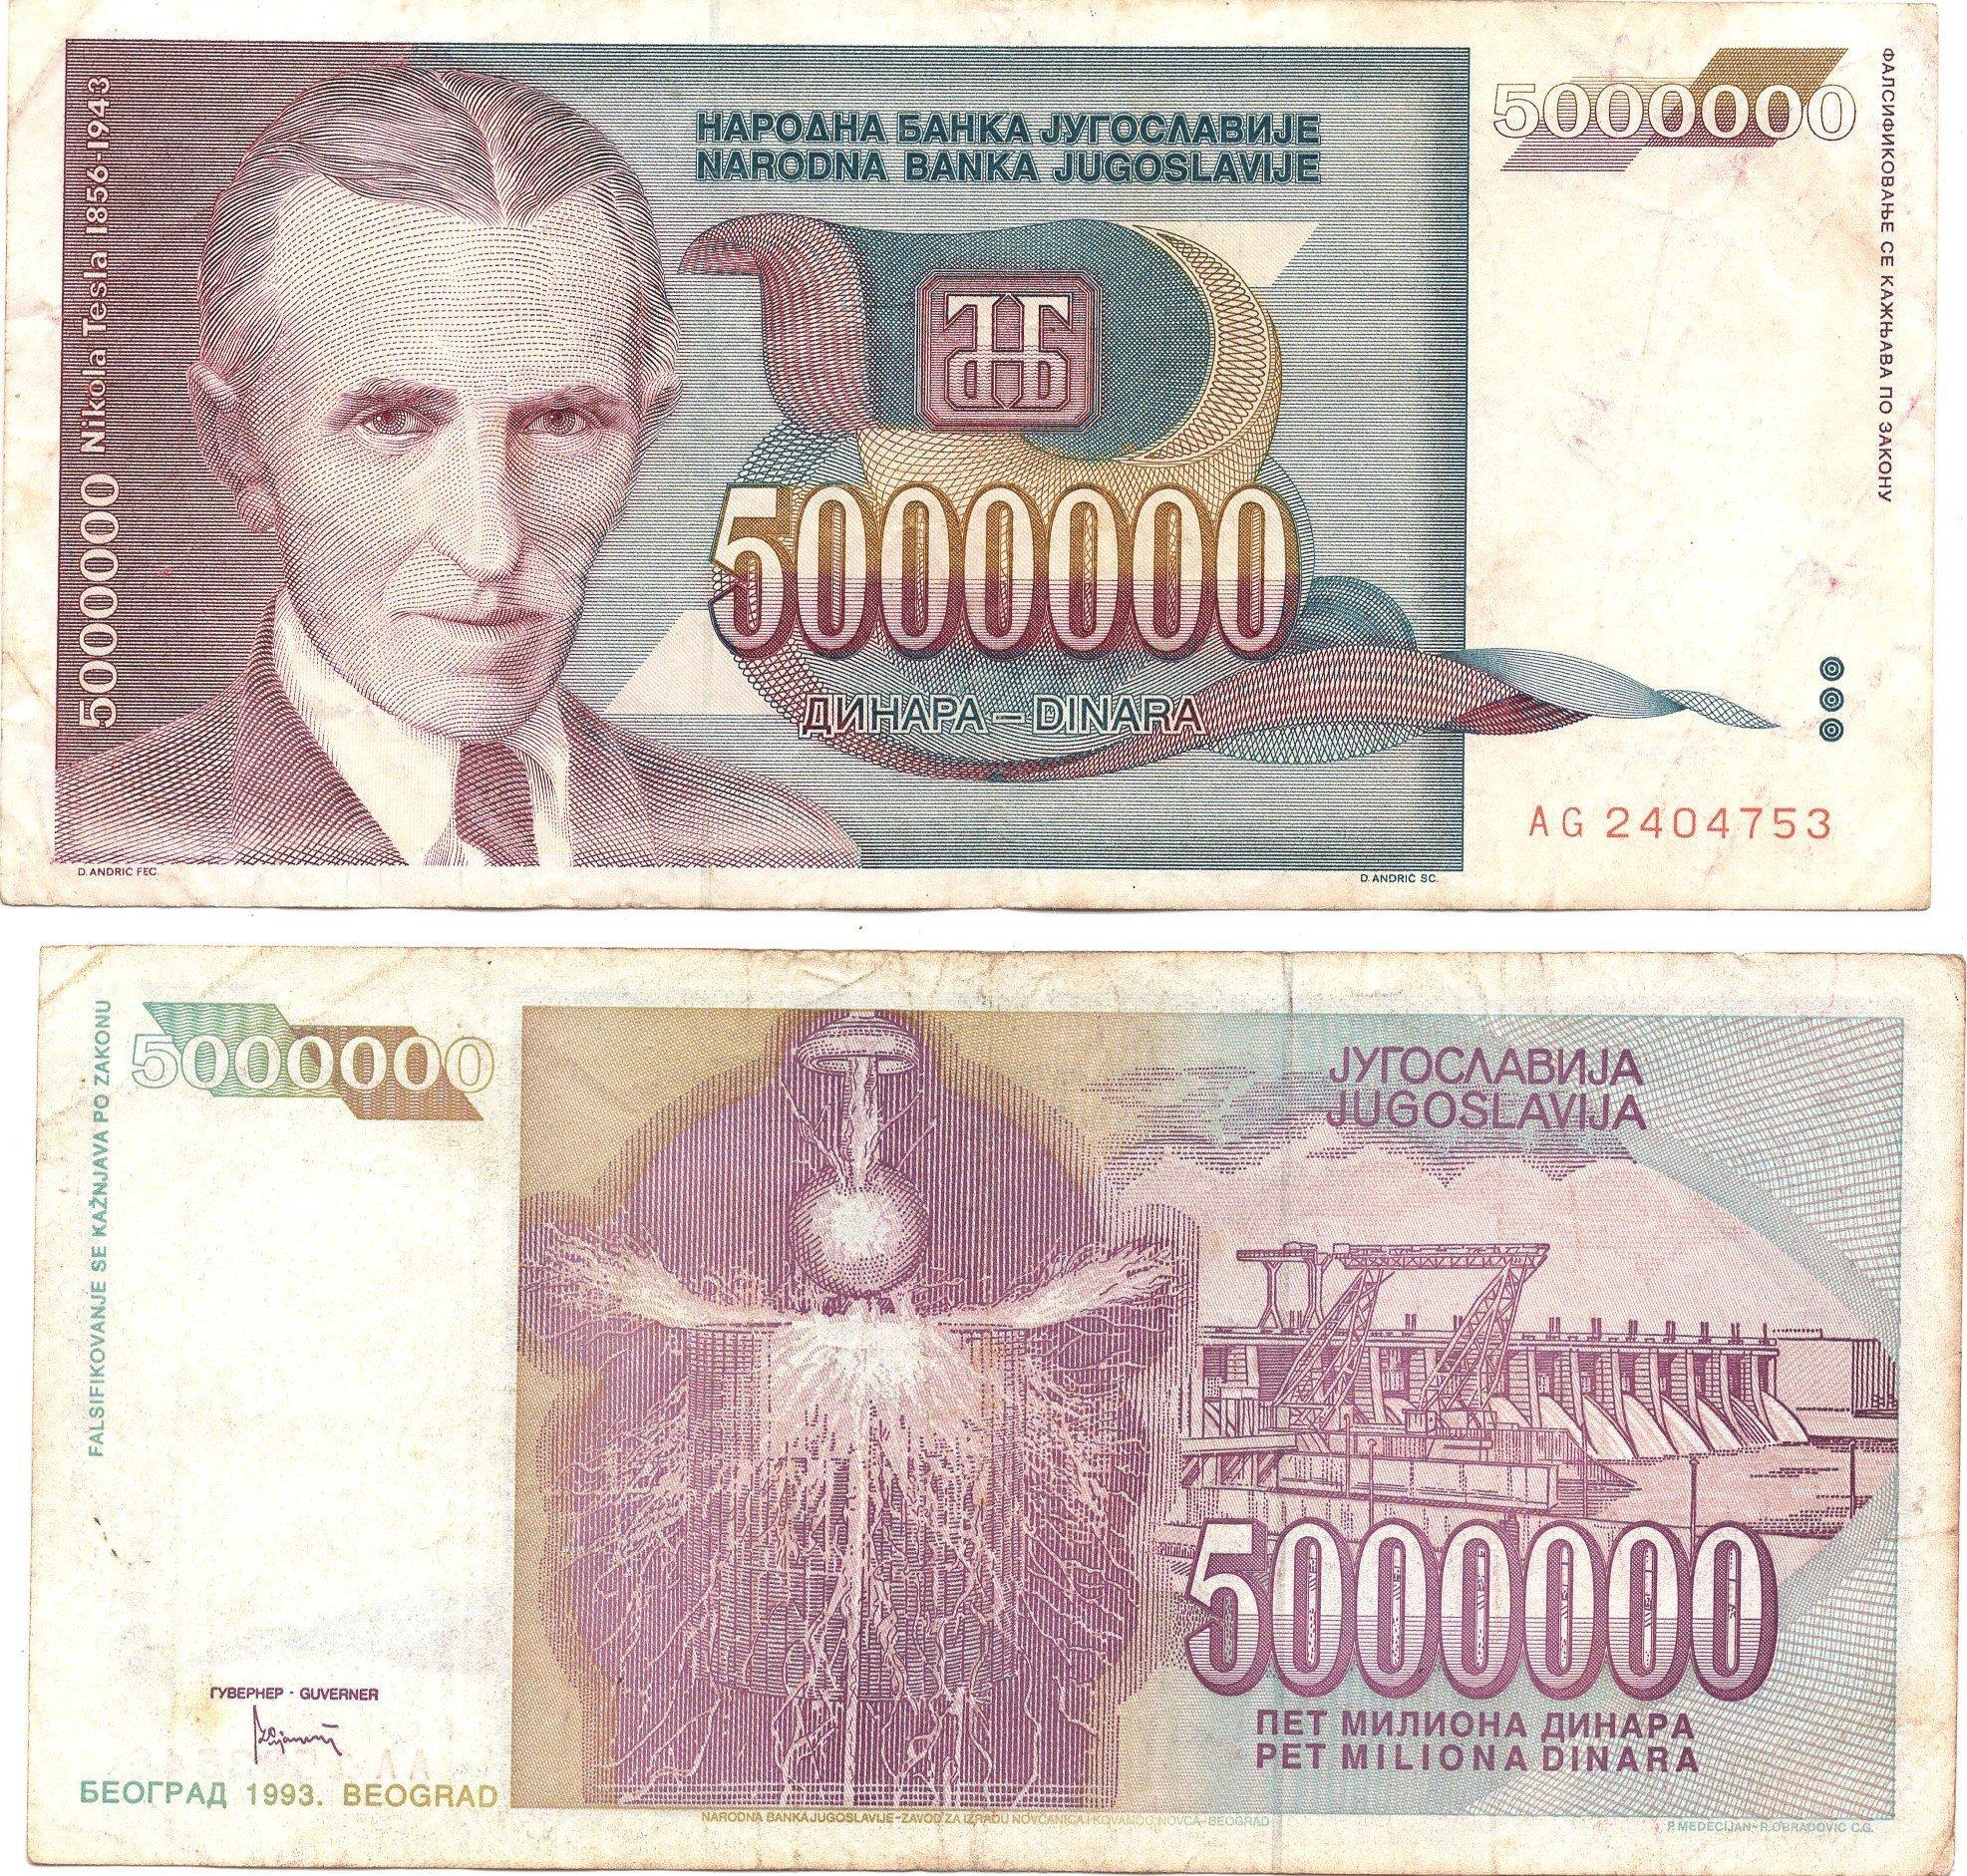 Yugoslavia 5000000 dinara 1993